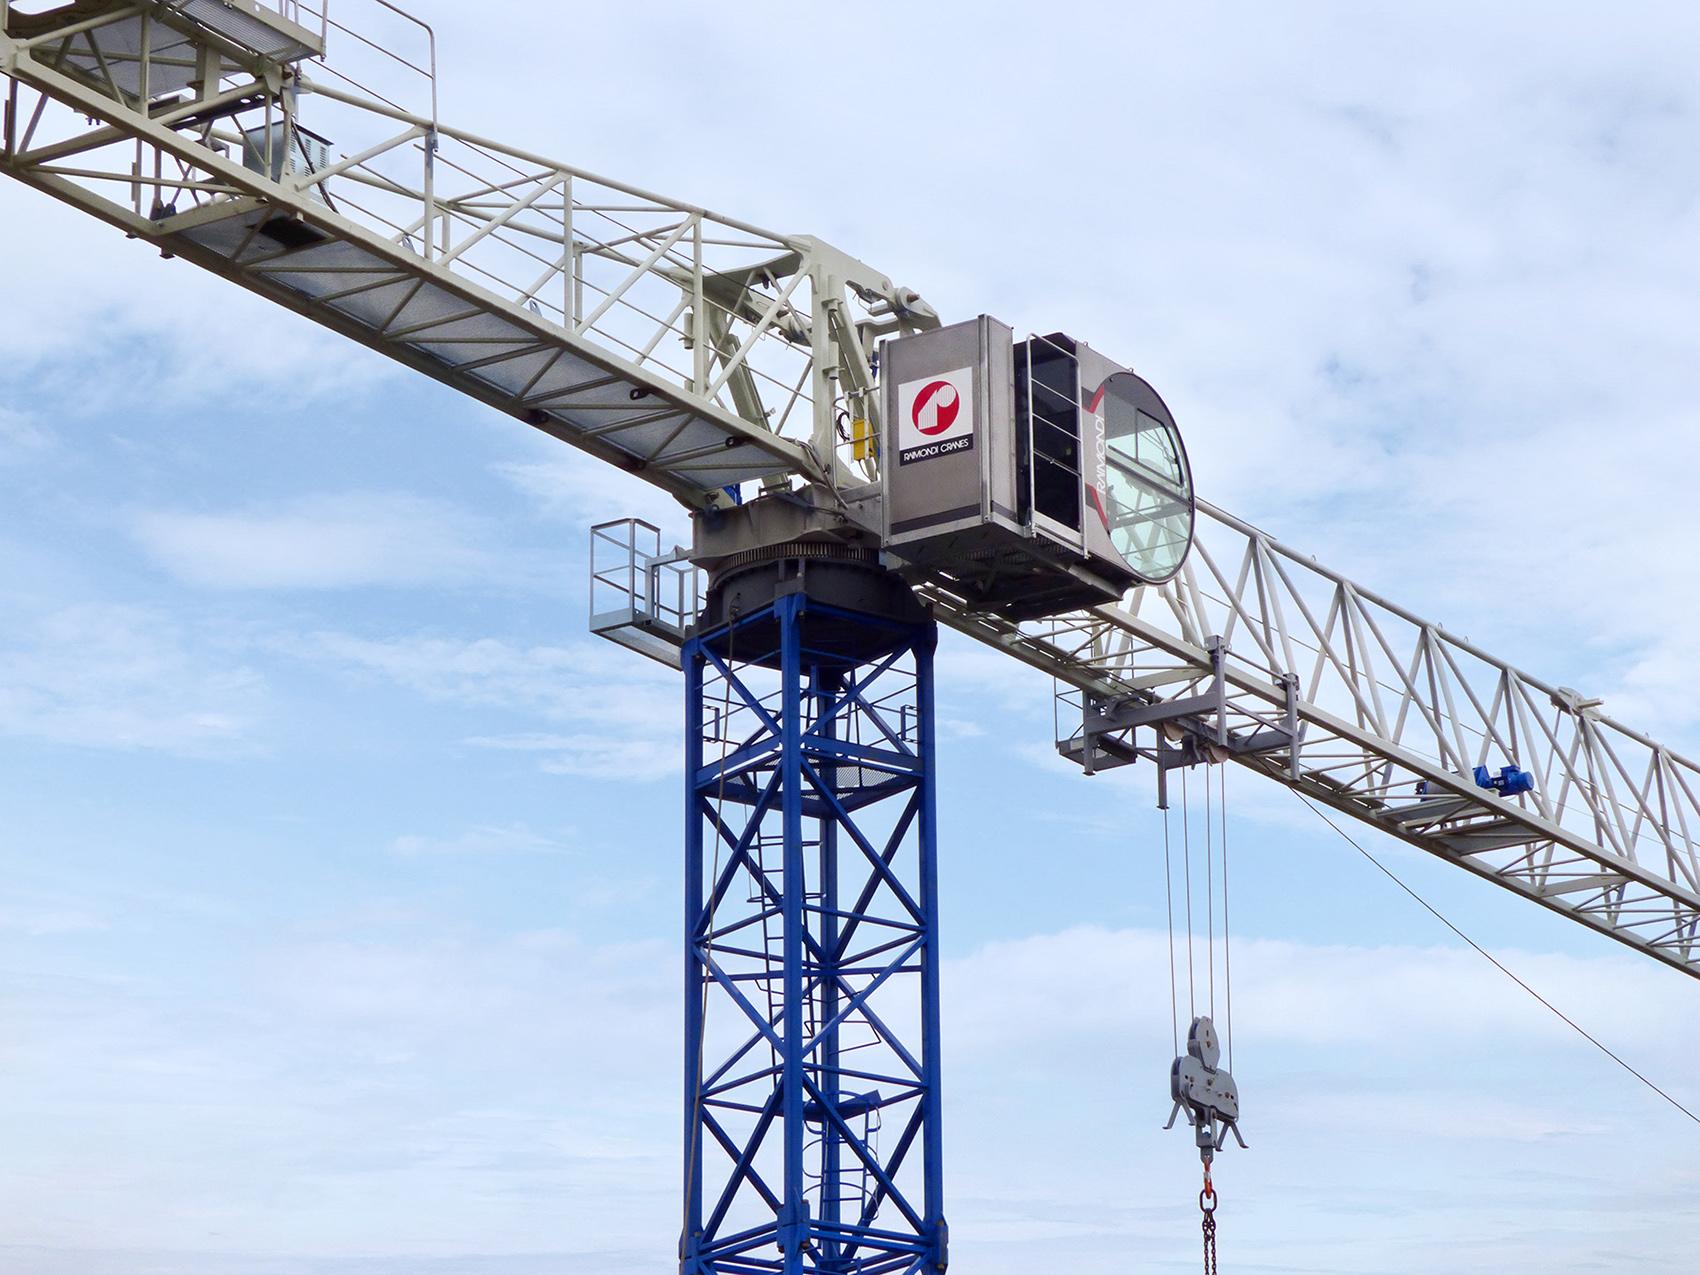 Tower Crane New Technology : Raimondi launches the mrt flattop tower crane